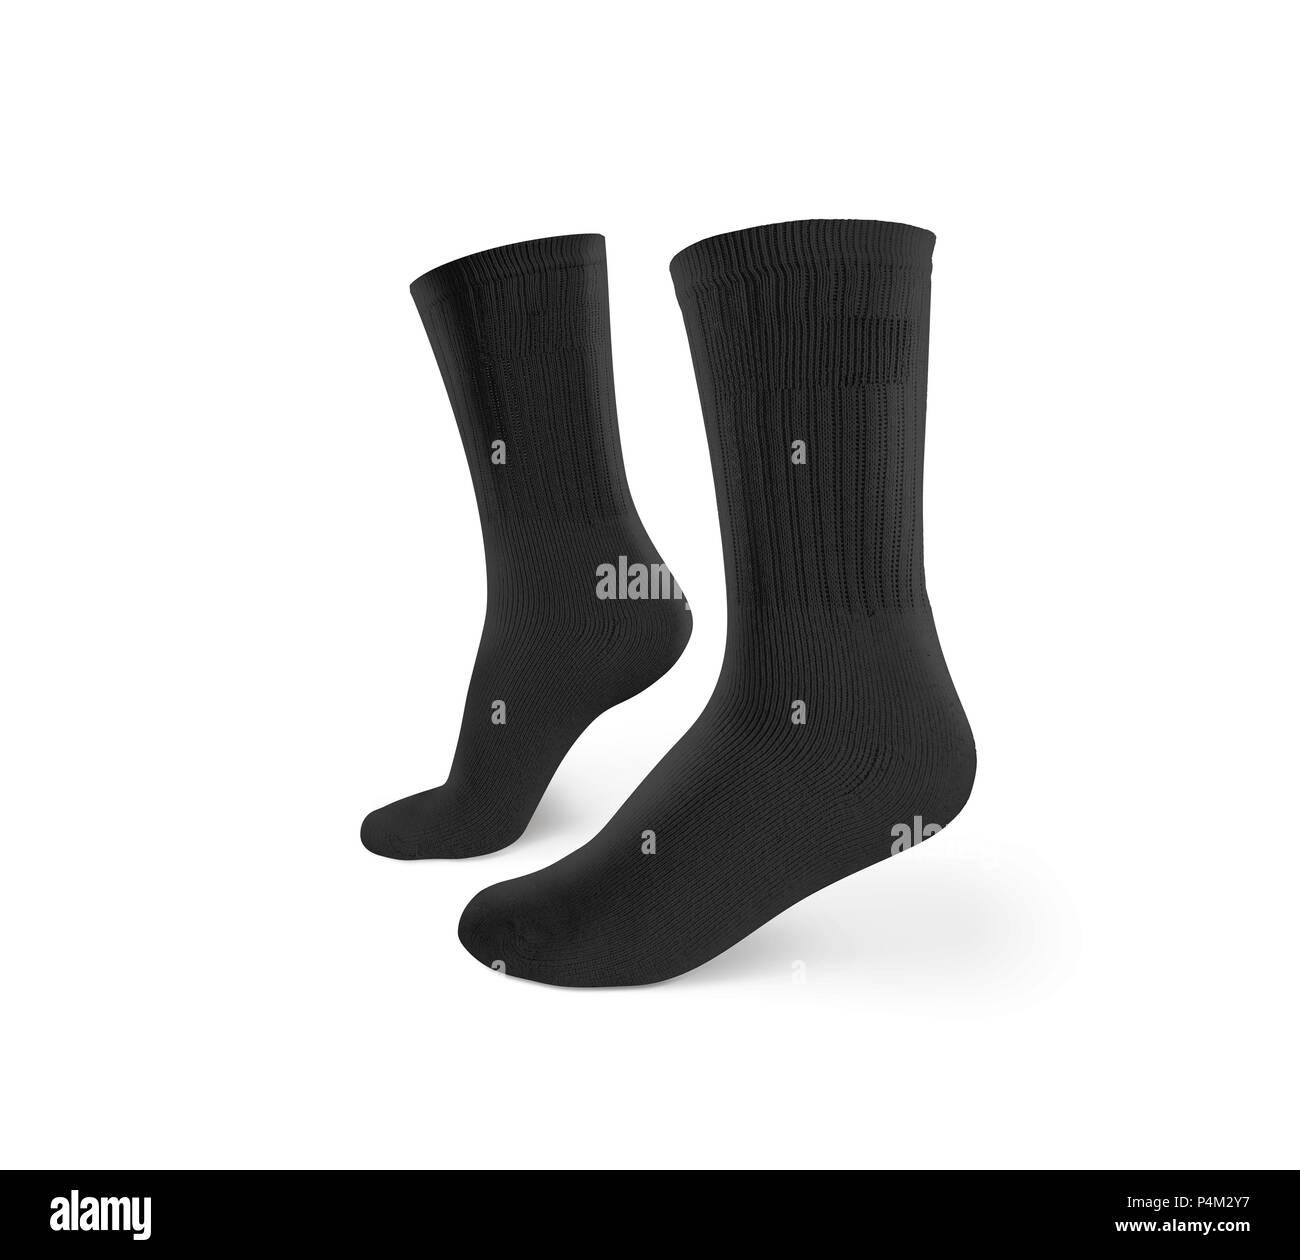 blank black socks design mockup isolated clipping path pair sport